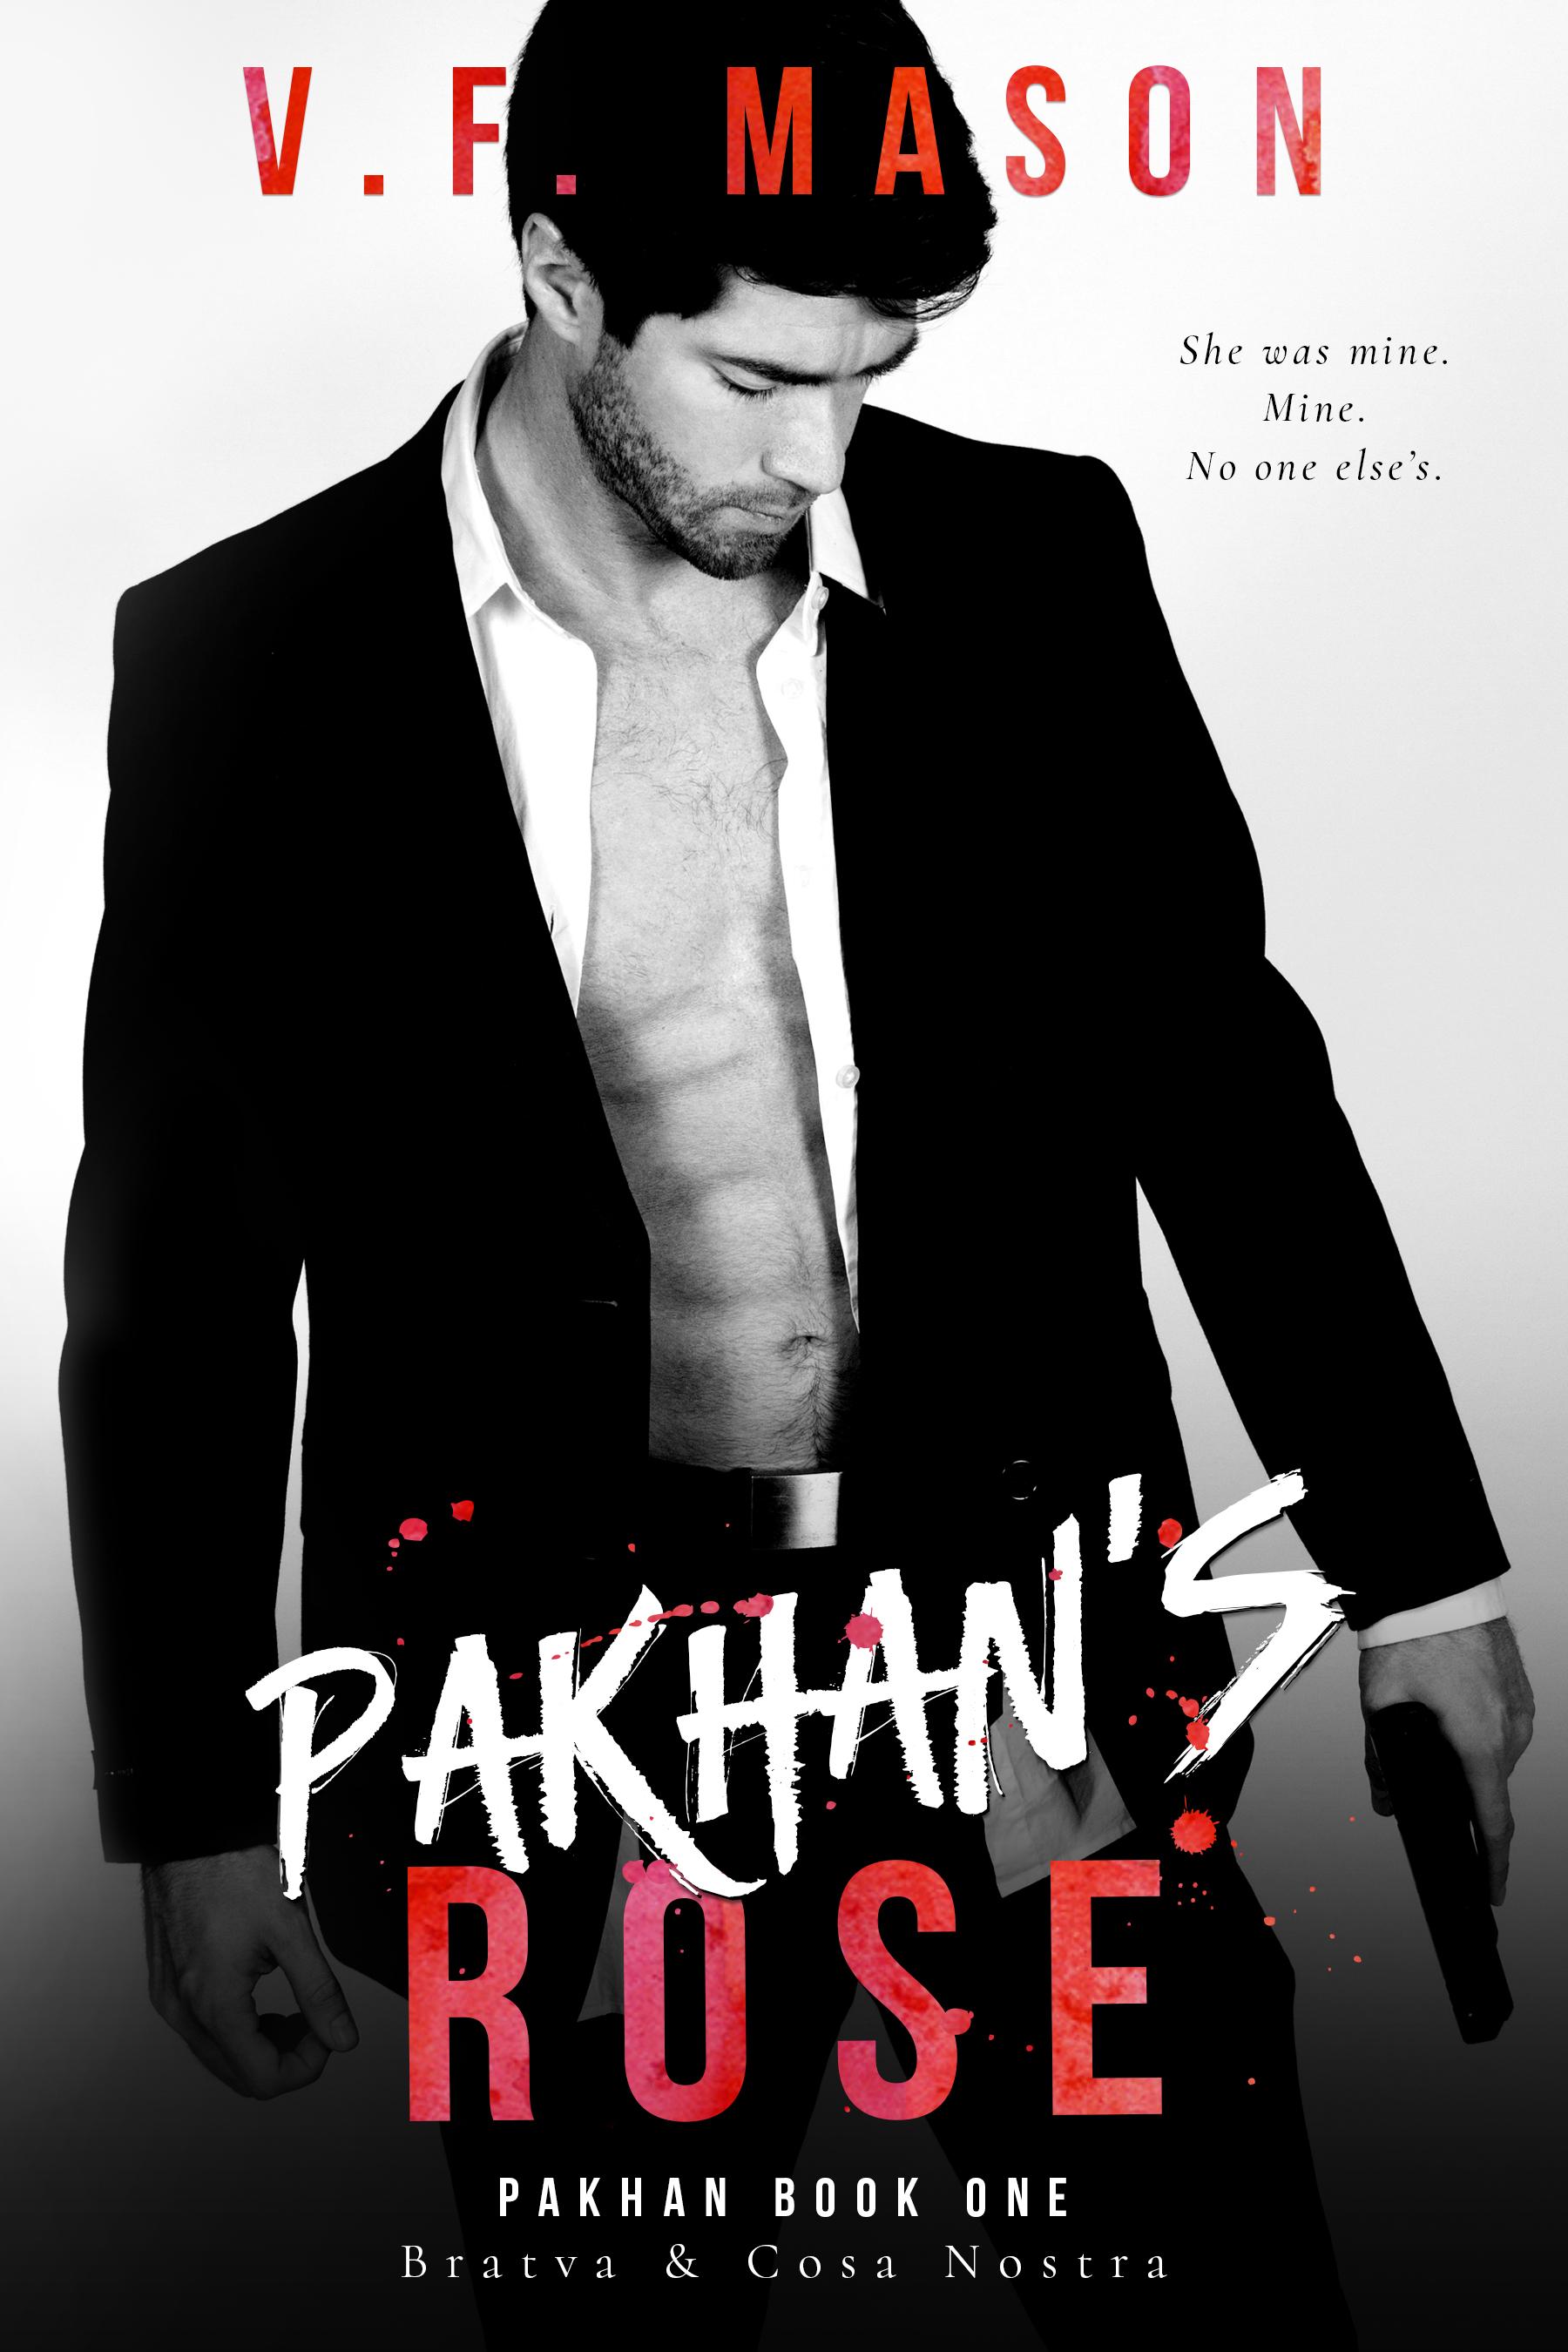 Pakhan's Rose (Pakhan Duet #1) by V.F. Mason